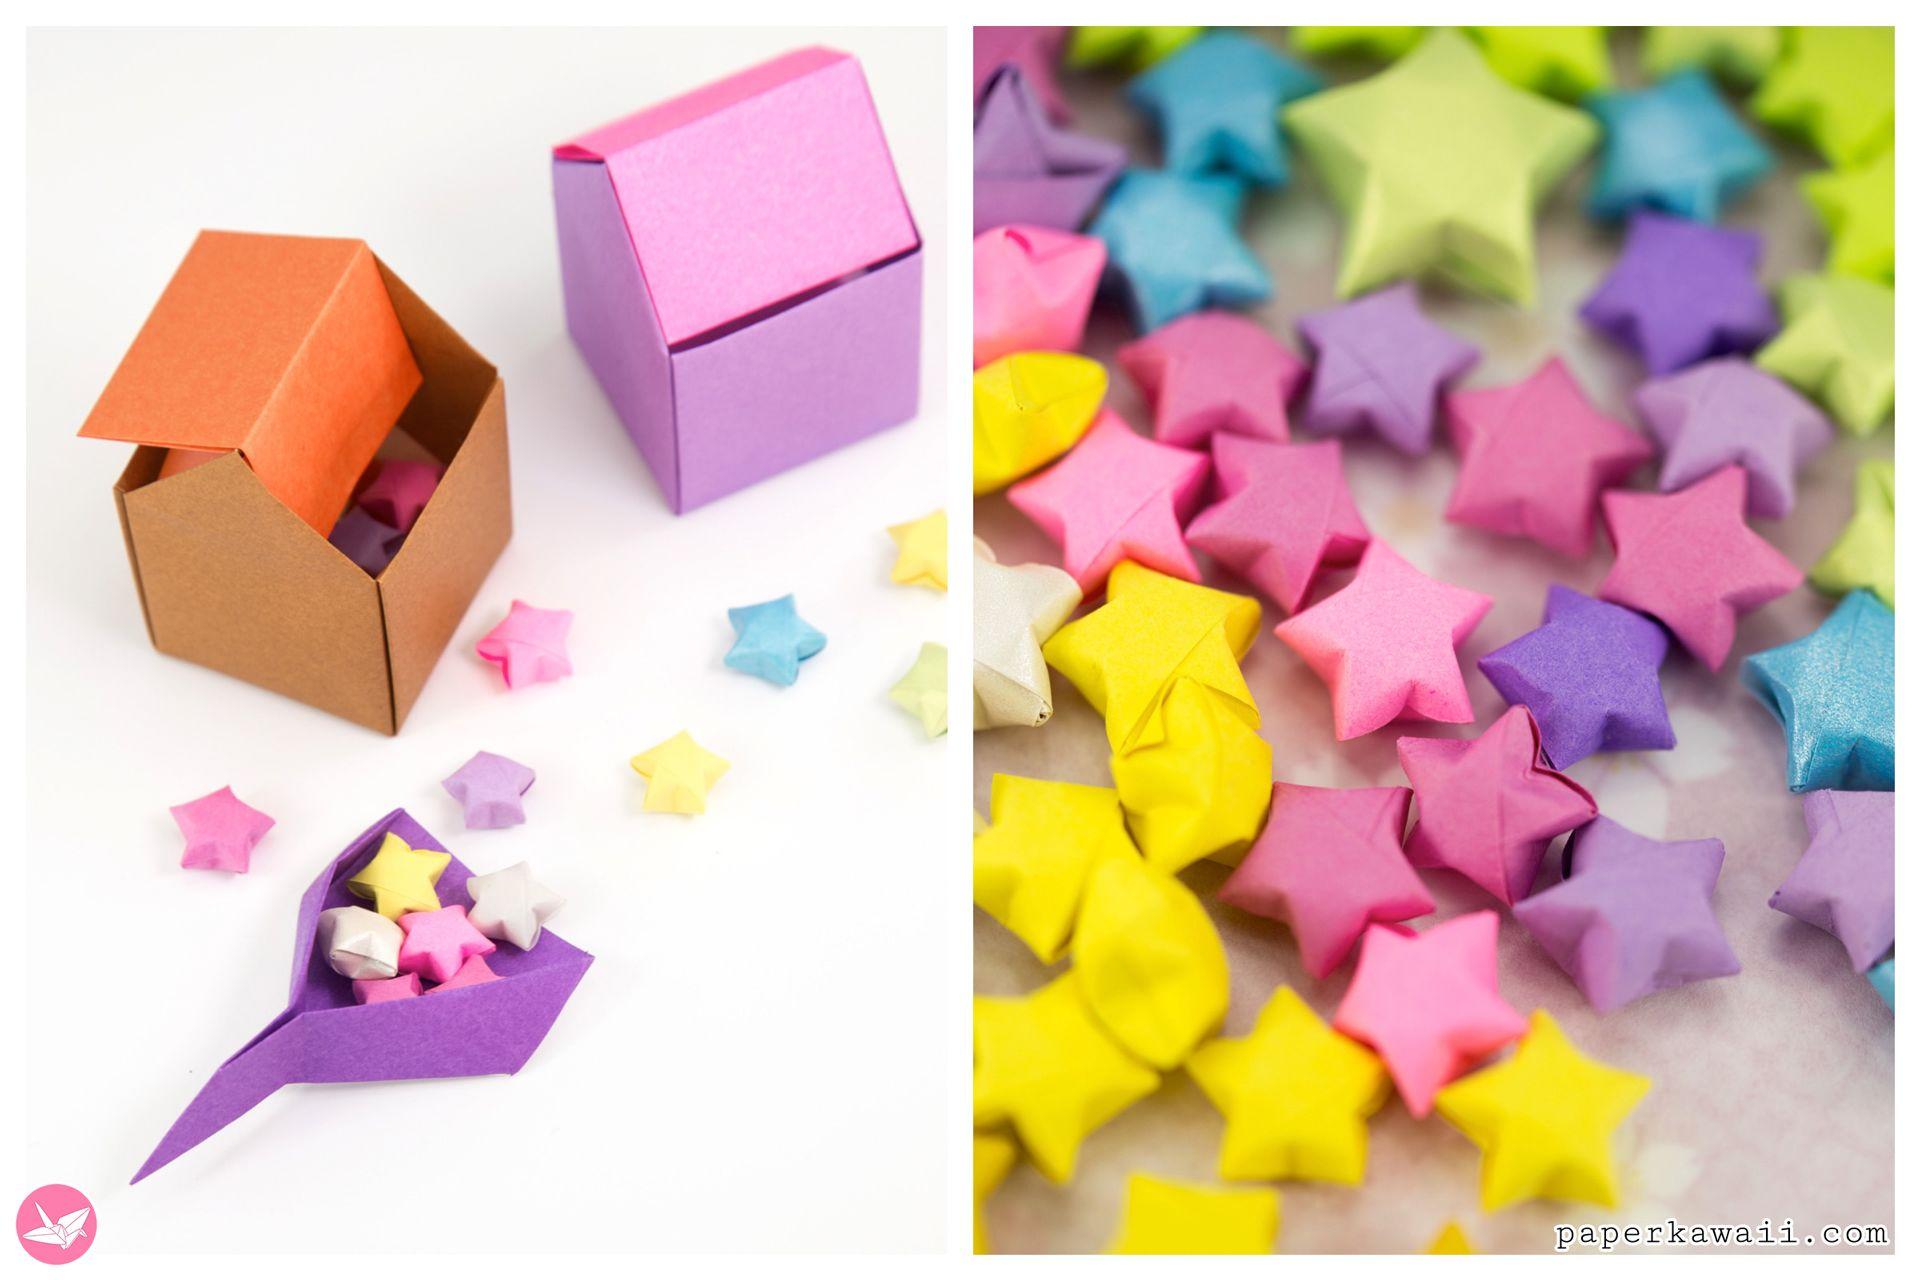 Origami Horse Tutorial - Cute Origami Pony! - Paper Kawaii | 1280x1920